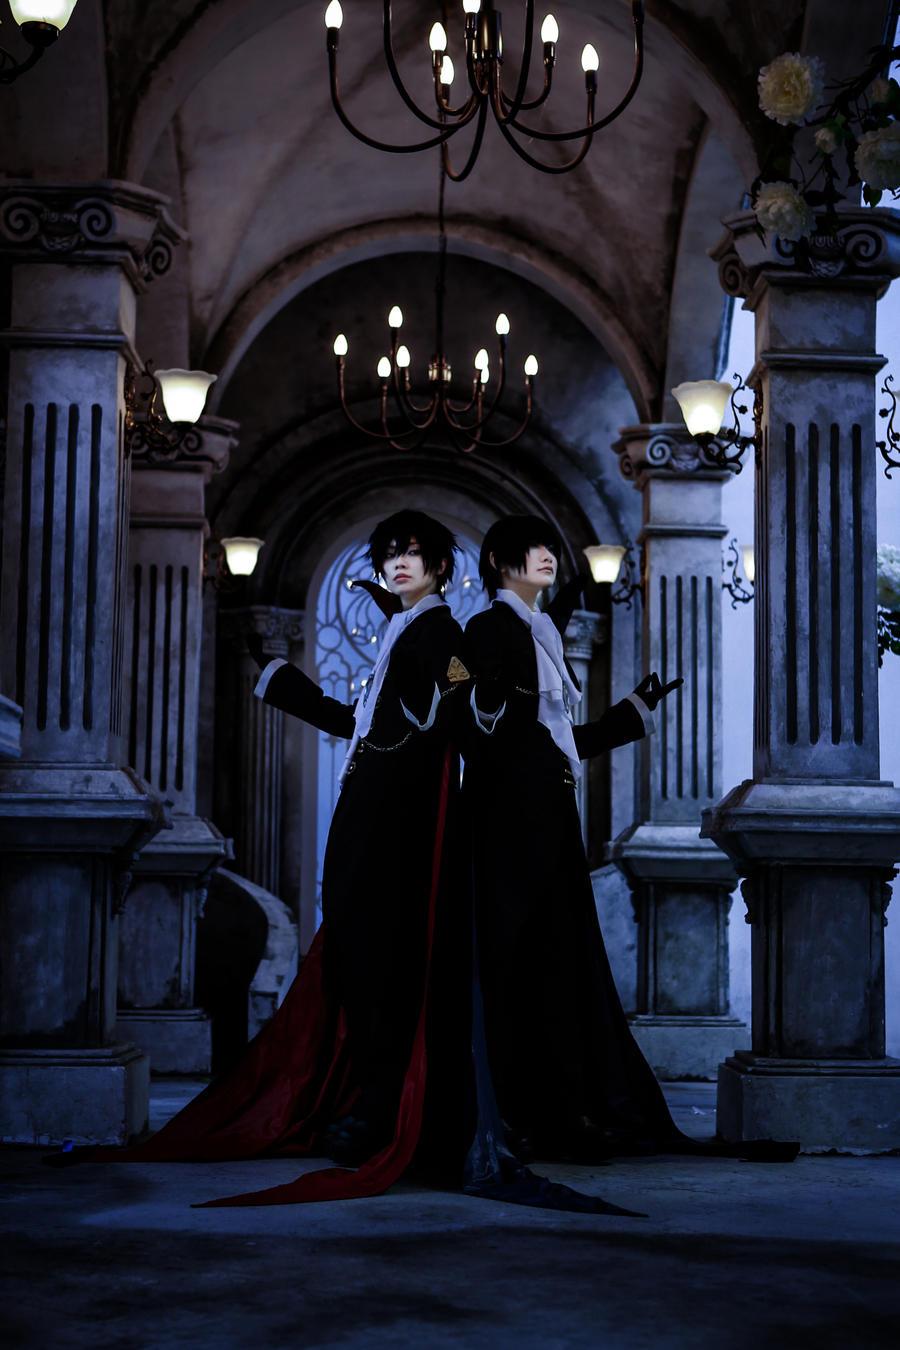 [TSUBASA -RESERVoir CHRoNiCLE-] The vampire twin by Dan-Gyokuei